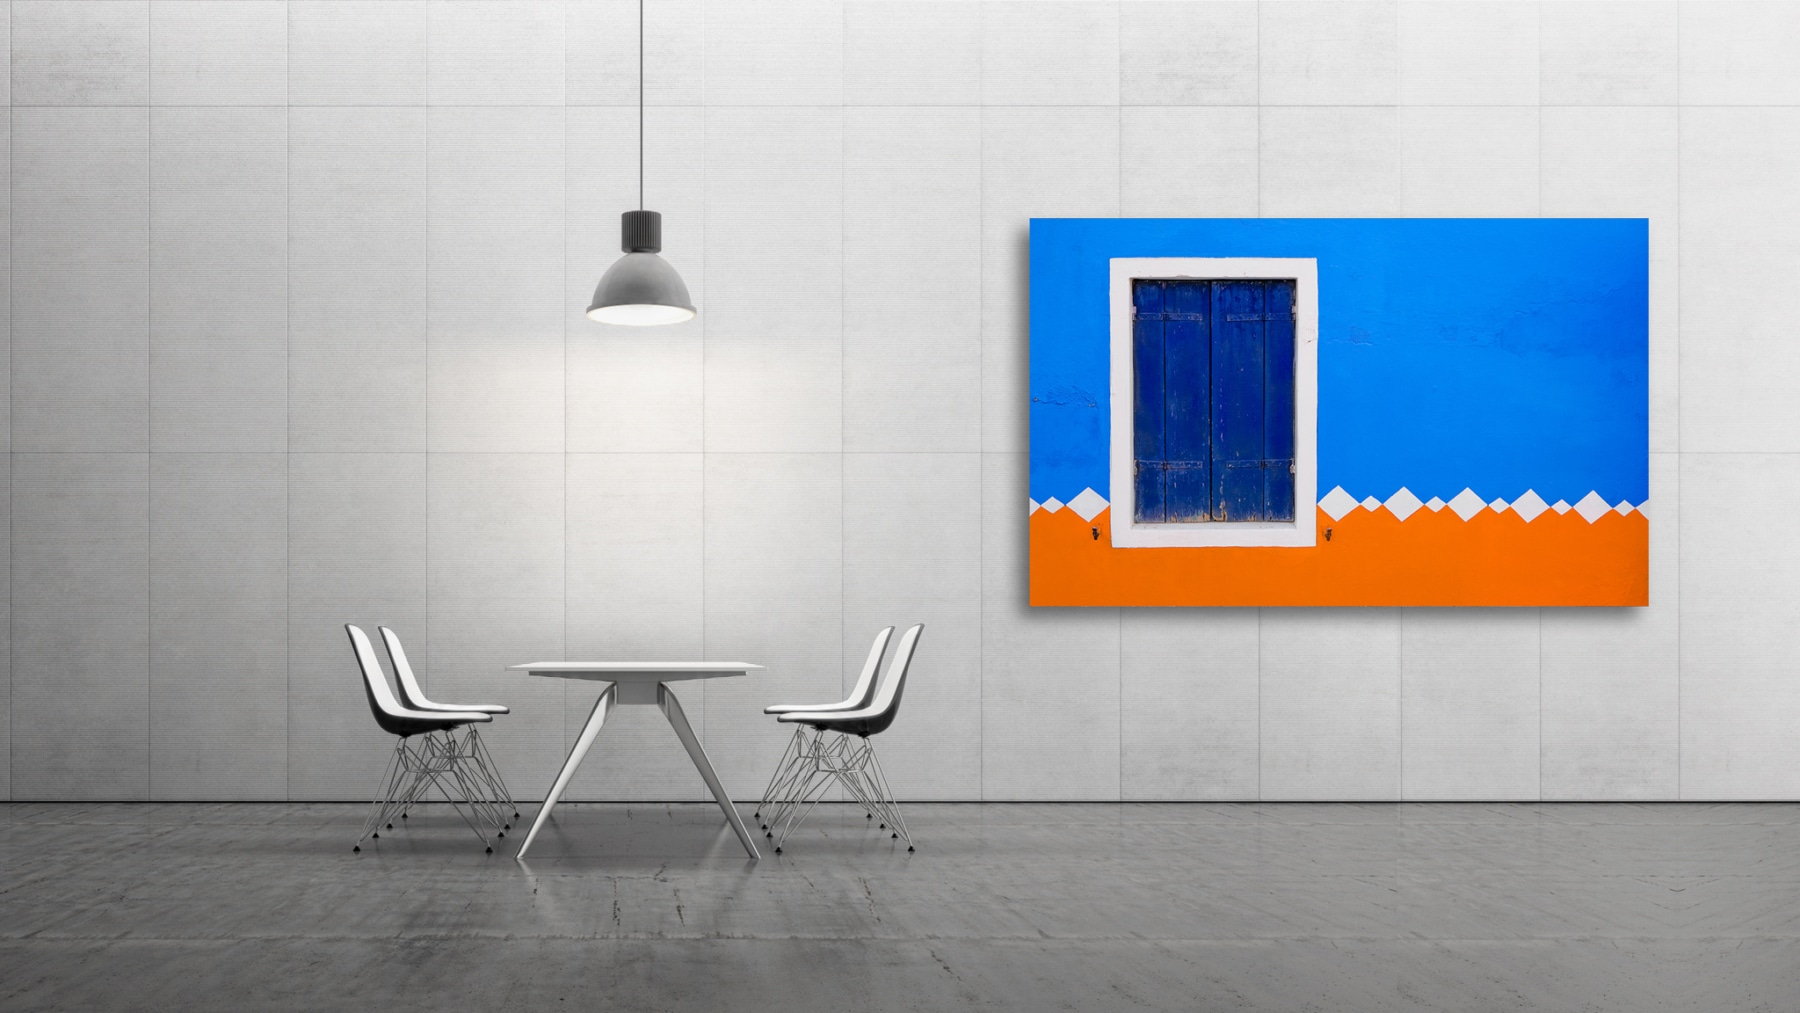 Blue Orange - Italy, Venice, Burano © by Gerry Pacher